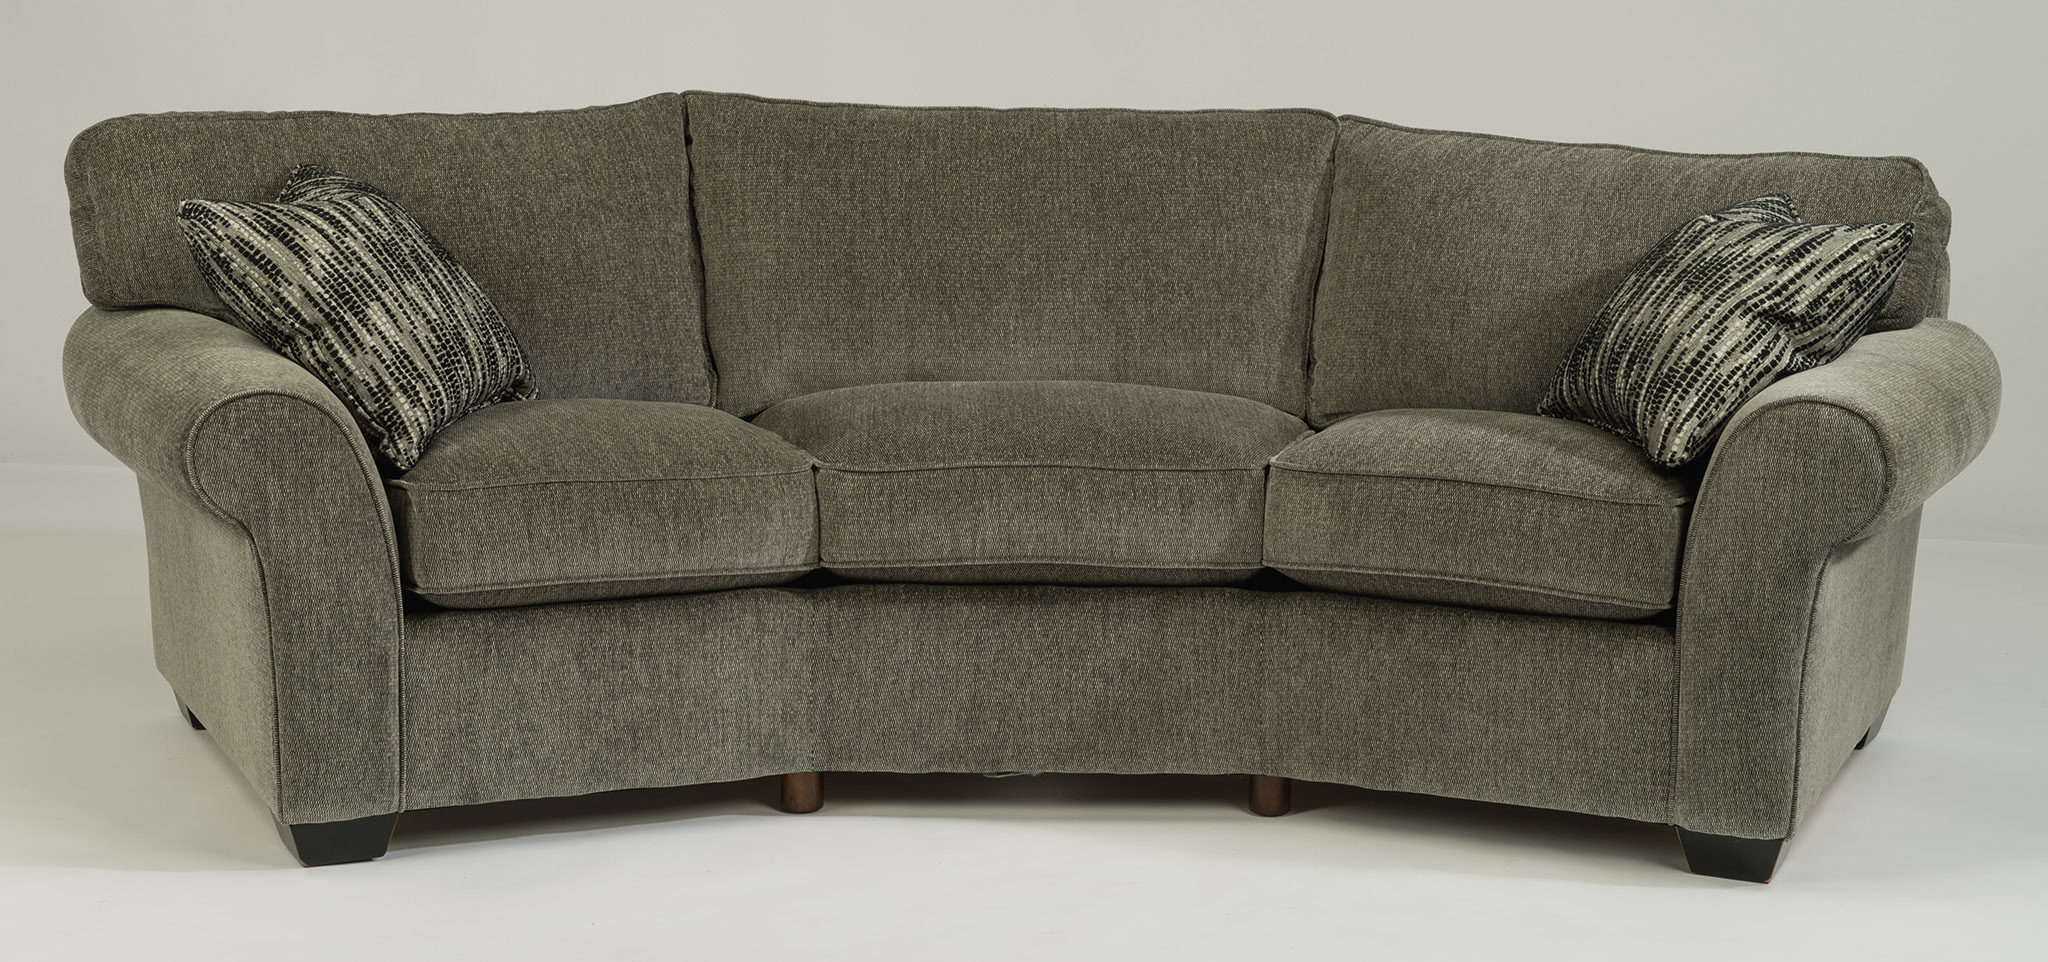 vail fabric conversation sofaflexsteel furniture